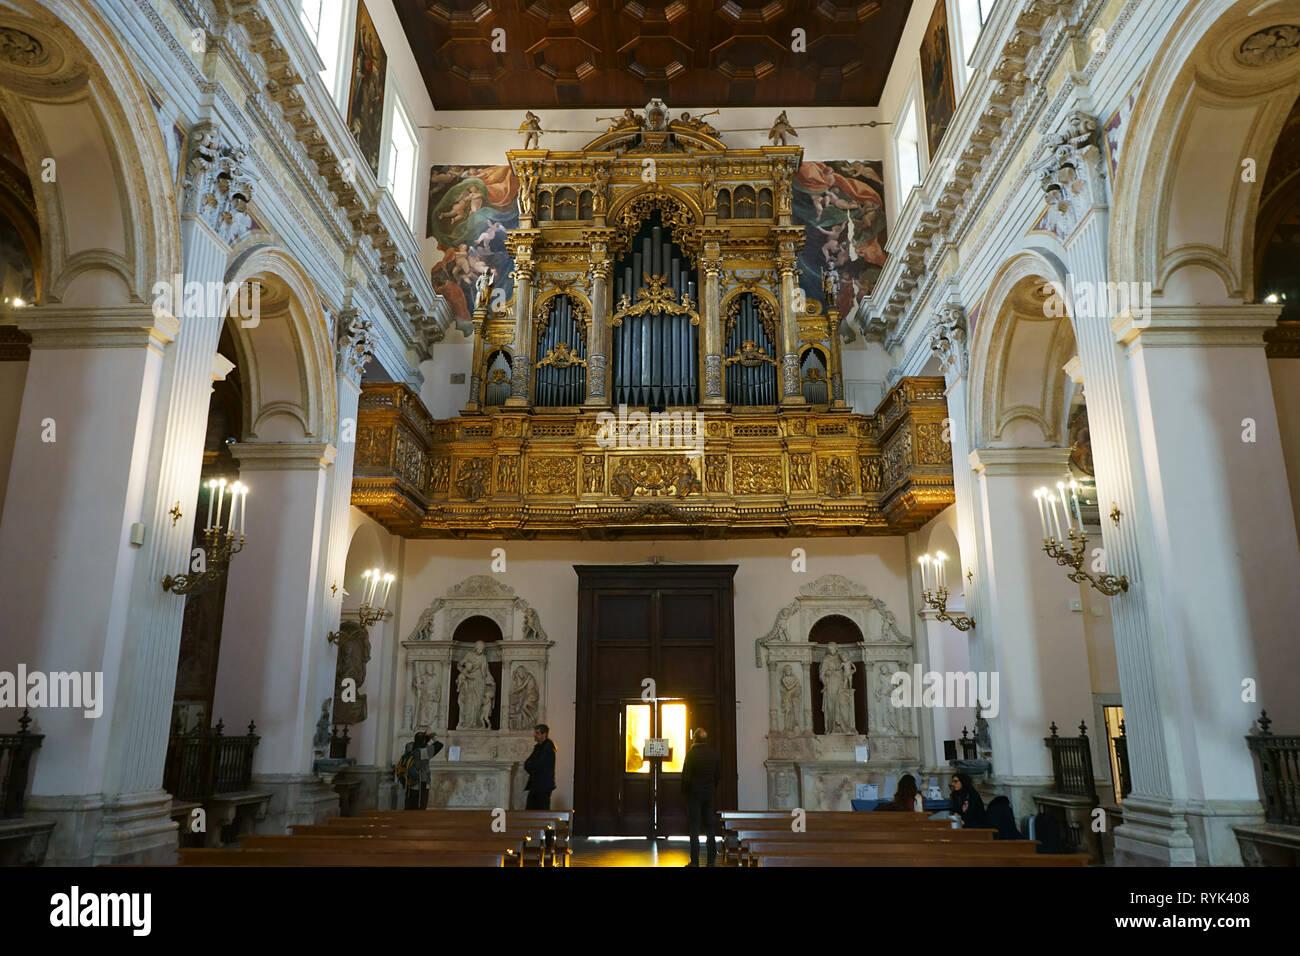 Chiesa Sant'Anna dei Lombardi, Nápoles, Italia Imagen De Stock